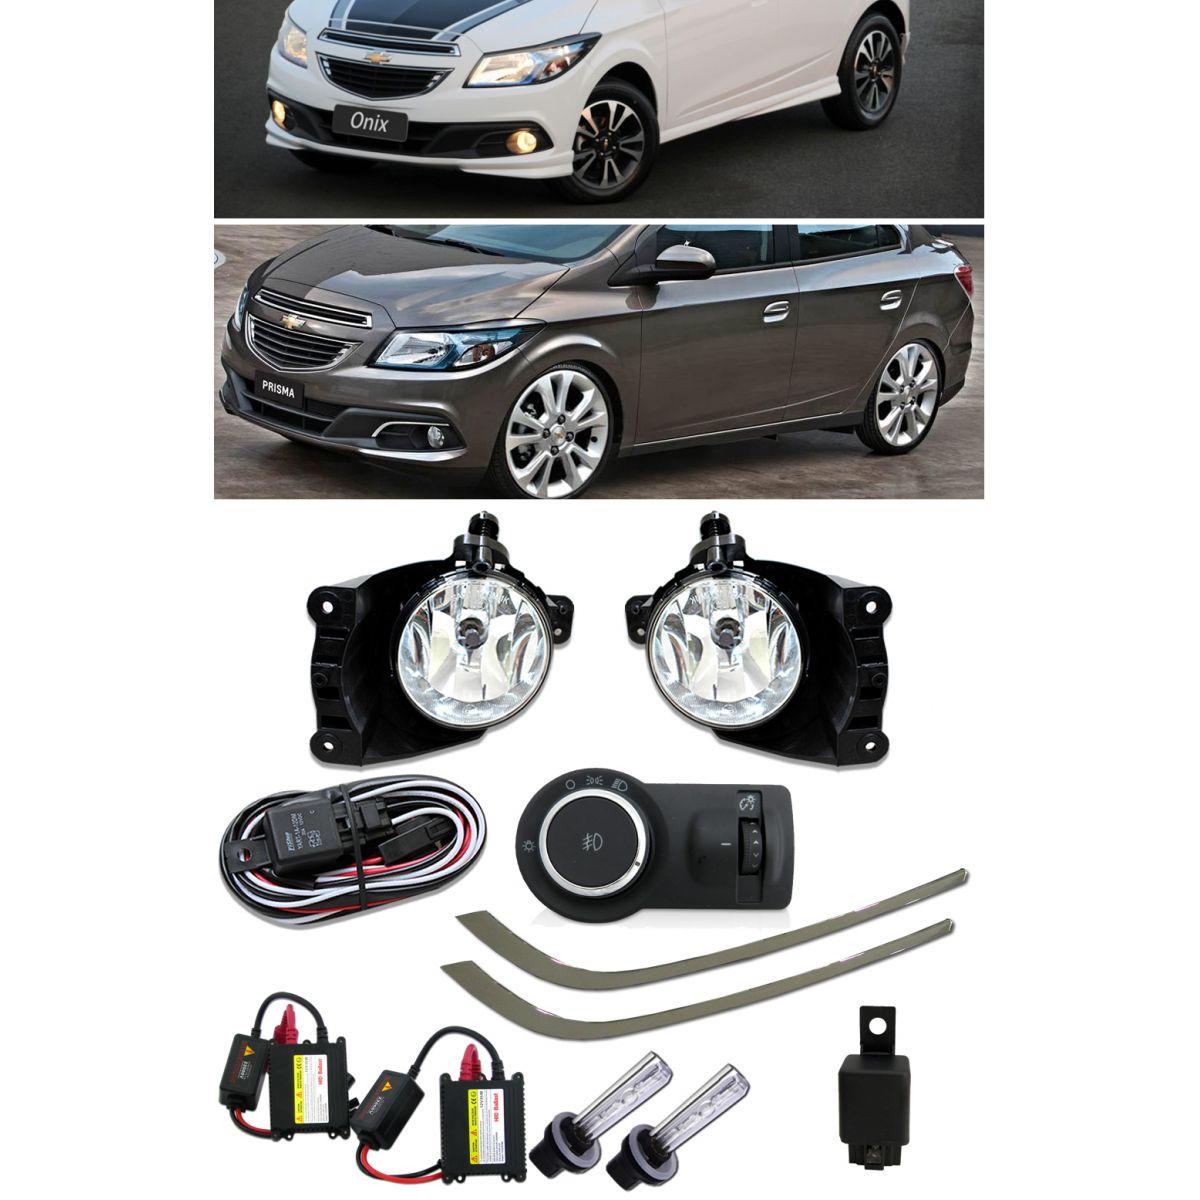 Kit Farol de Milha Neblina Chevrolet Novo Onix / Prisma LT 2013 á 2015+ Friso Cromado Pára-choque - Par ( 2 peças ) + Kit Xenon H27 Com Reator Digital -  6000K ou 8000K